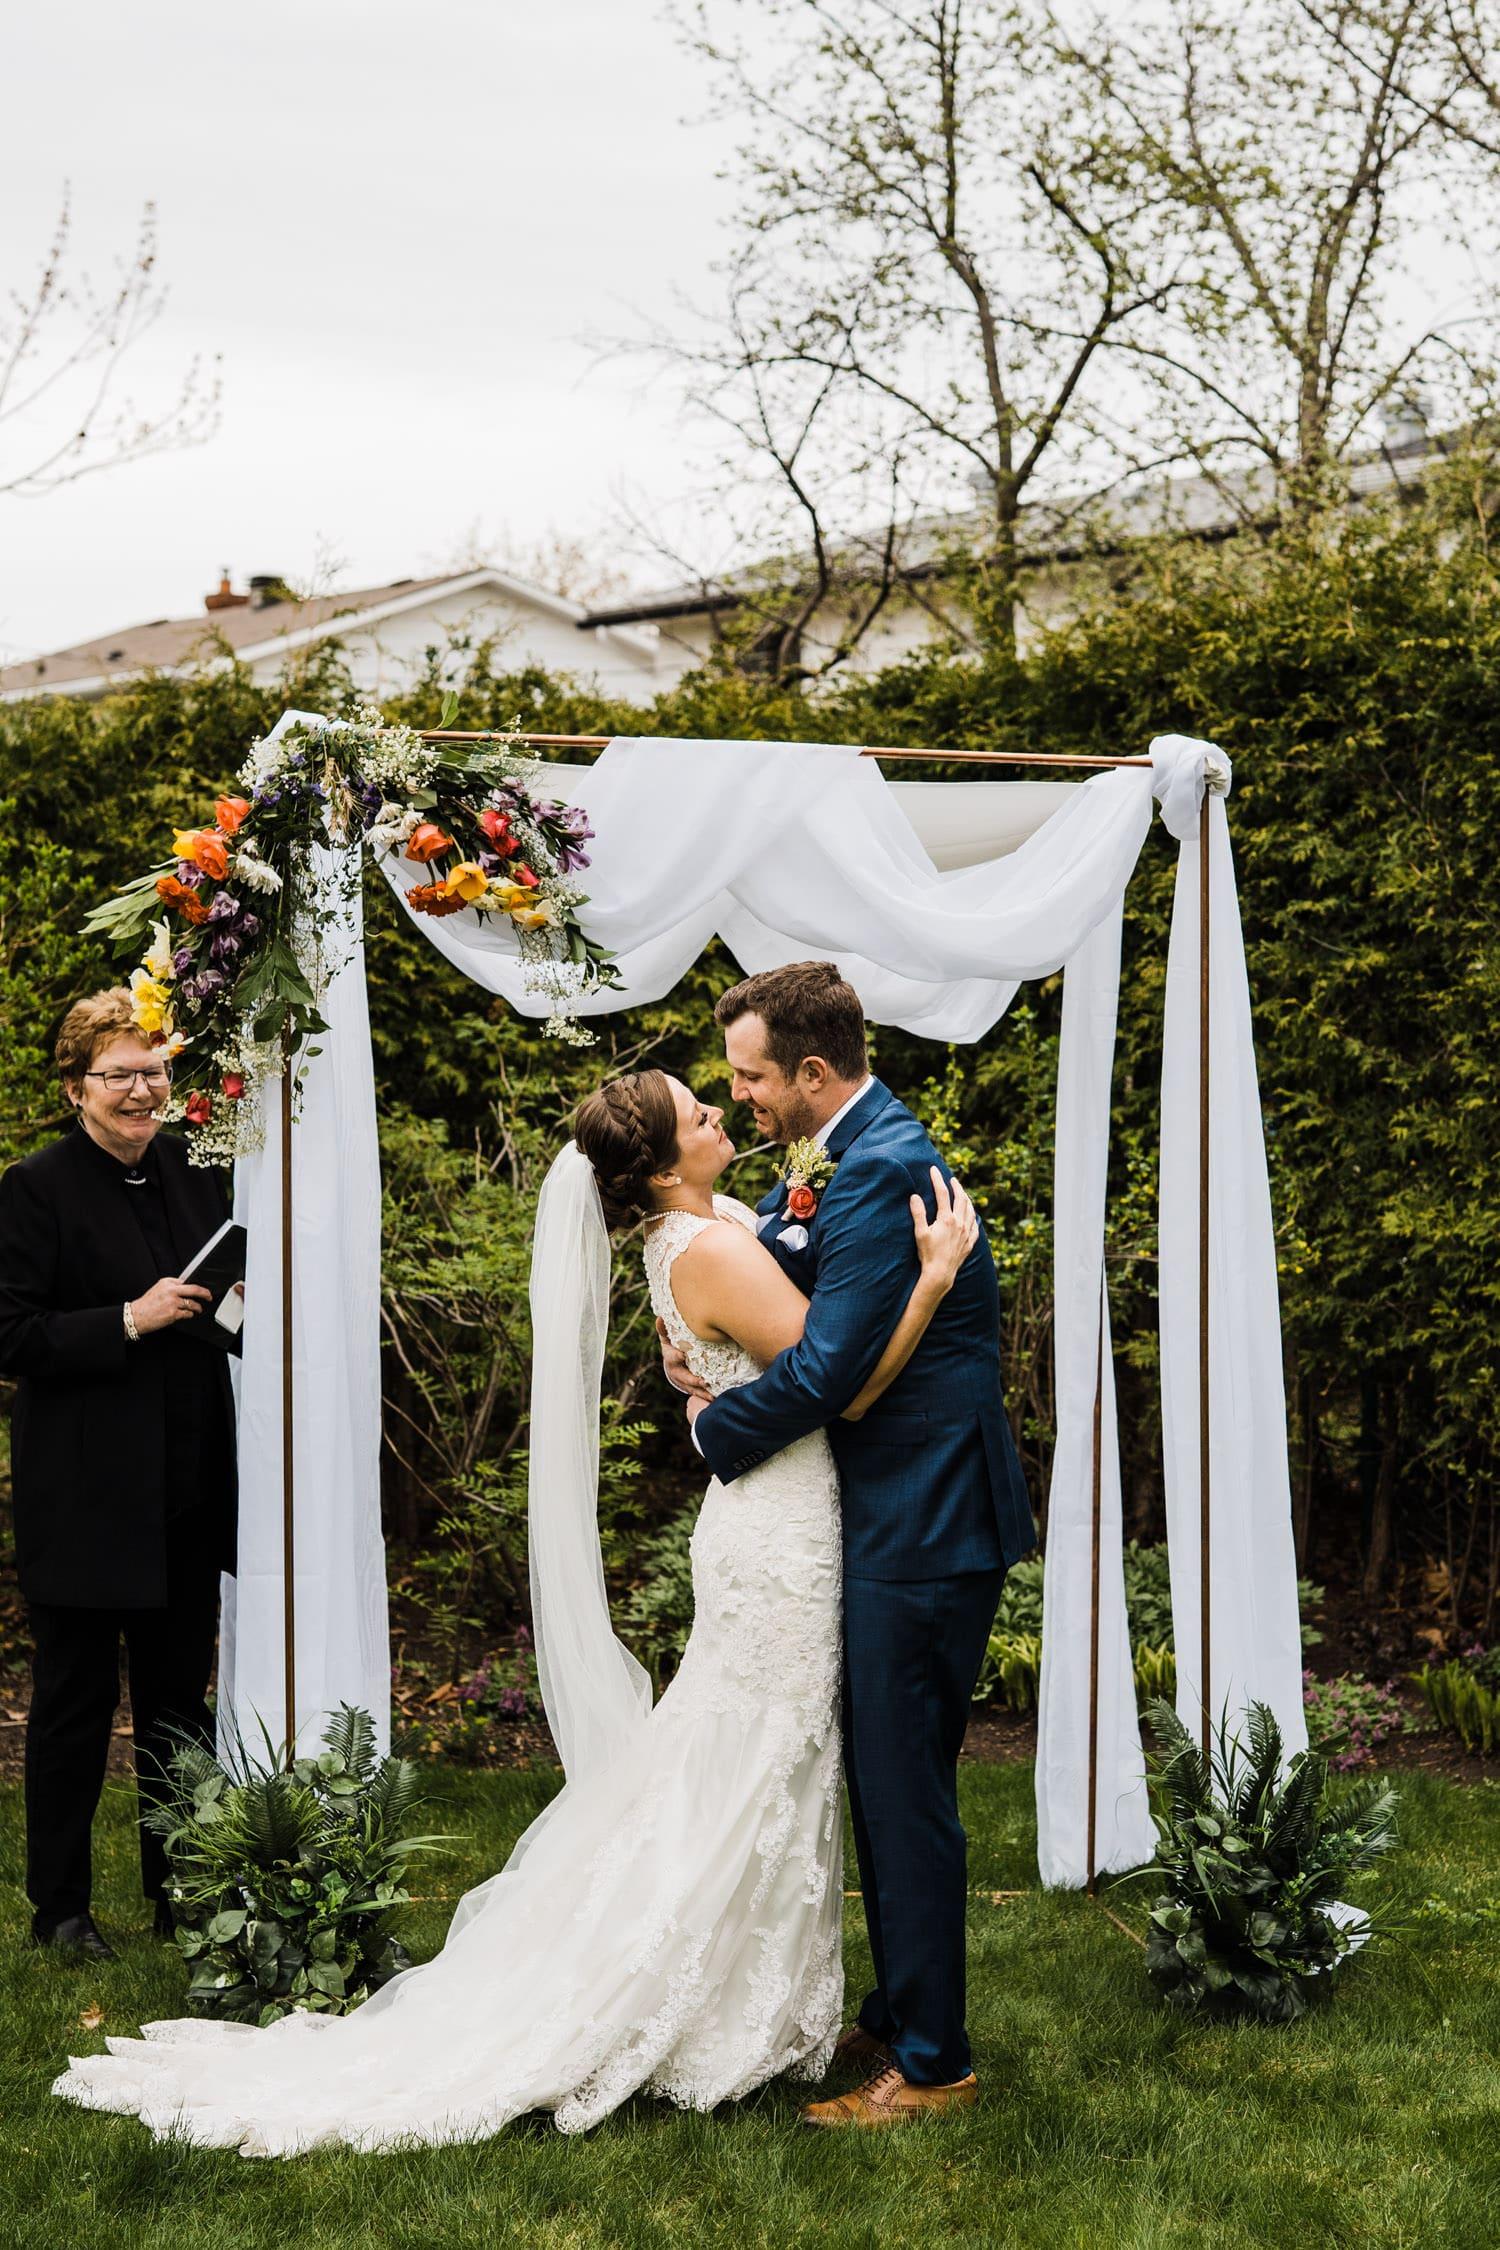 first kiss during intimate backyard ceremony - small backyard wedding ottawa